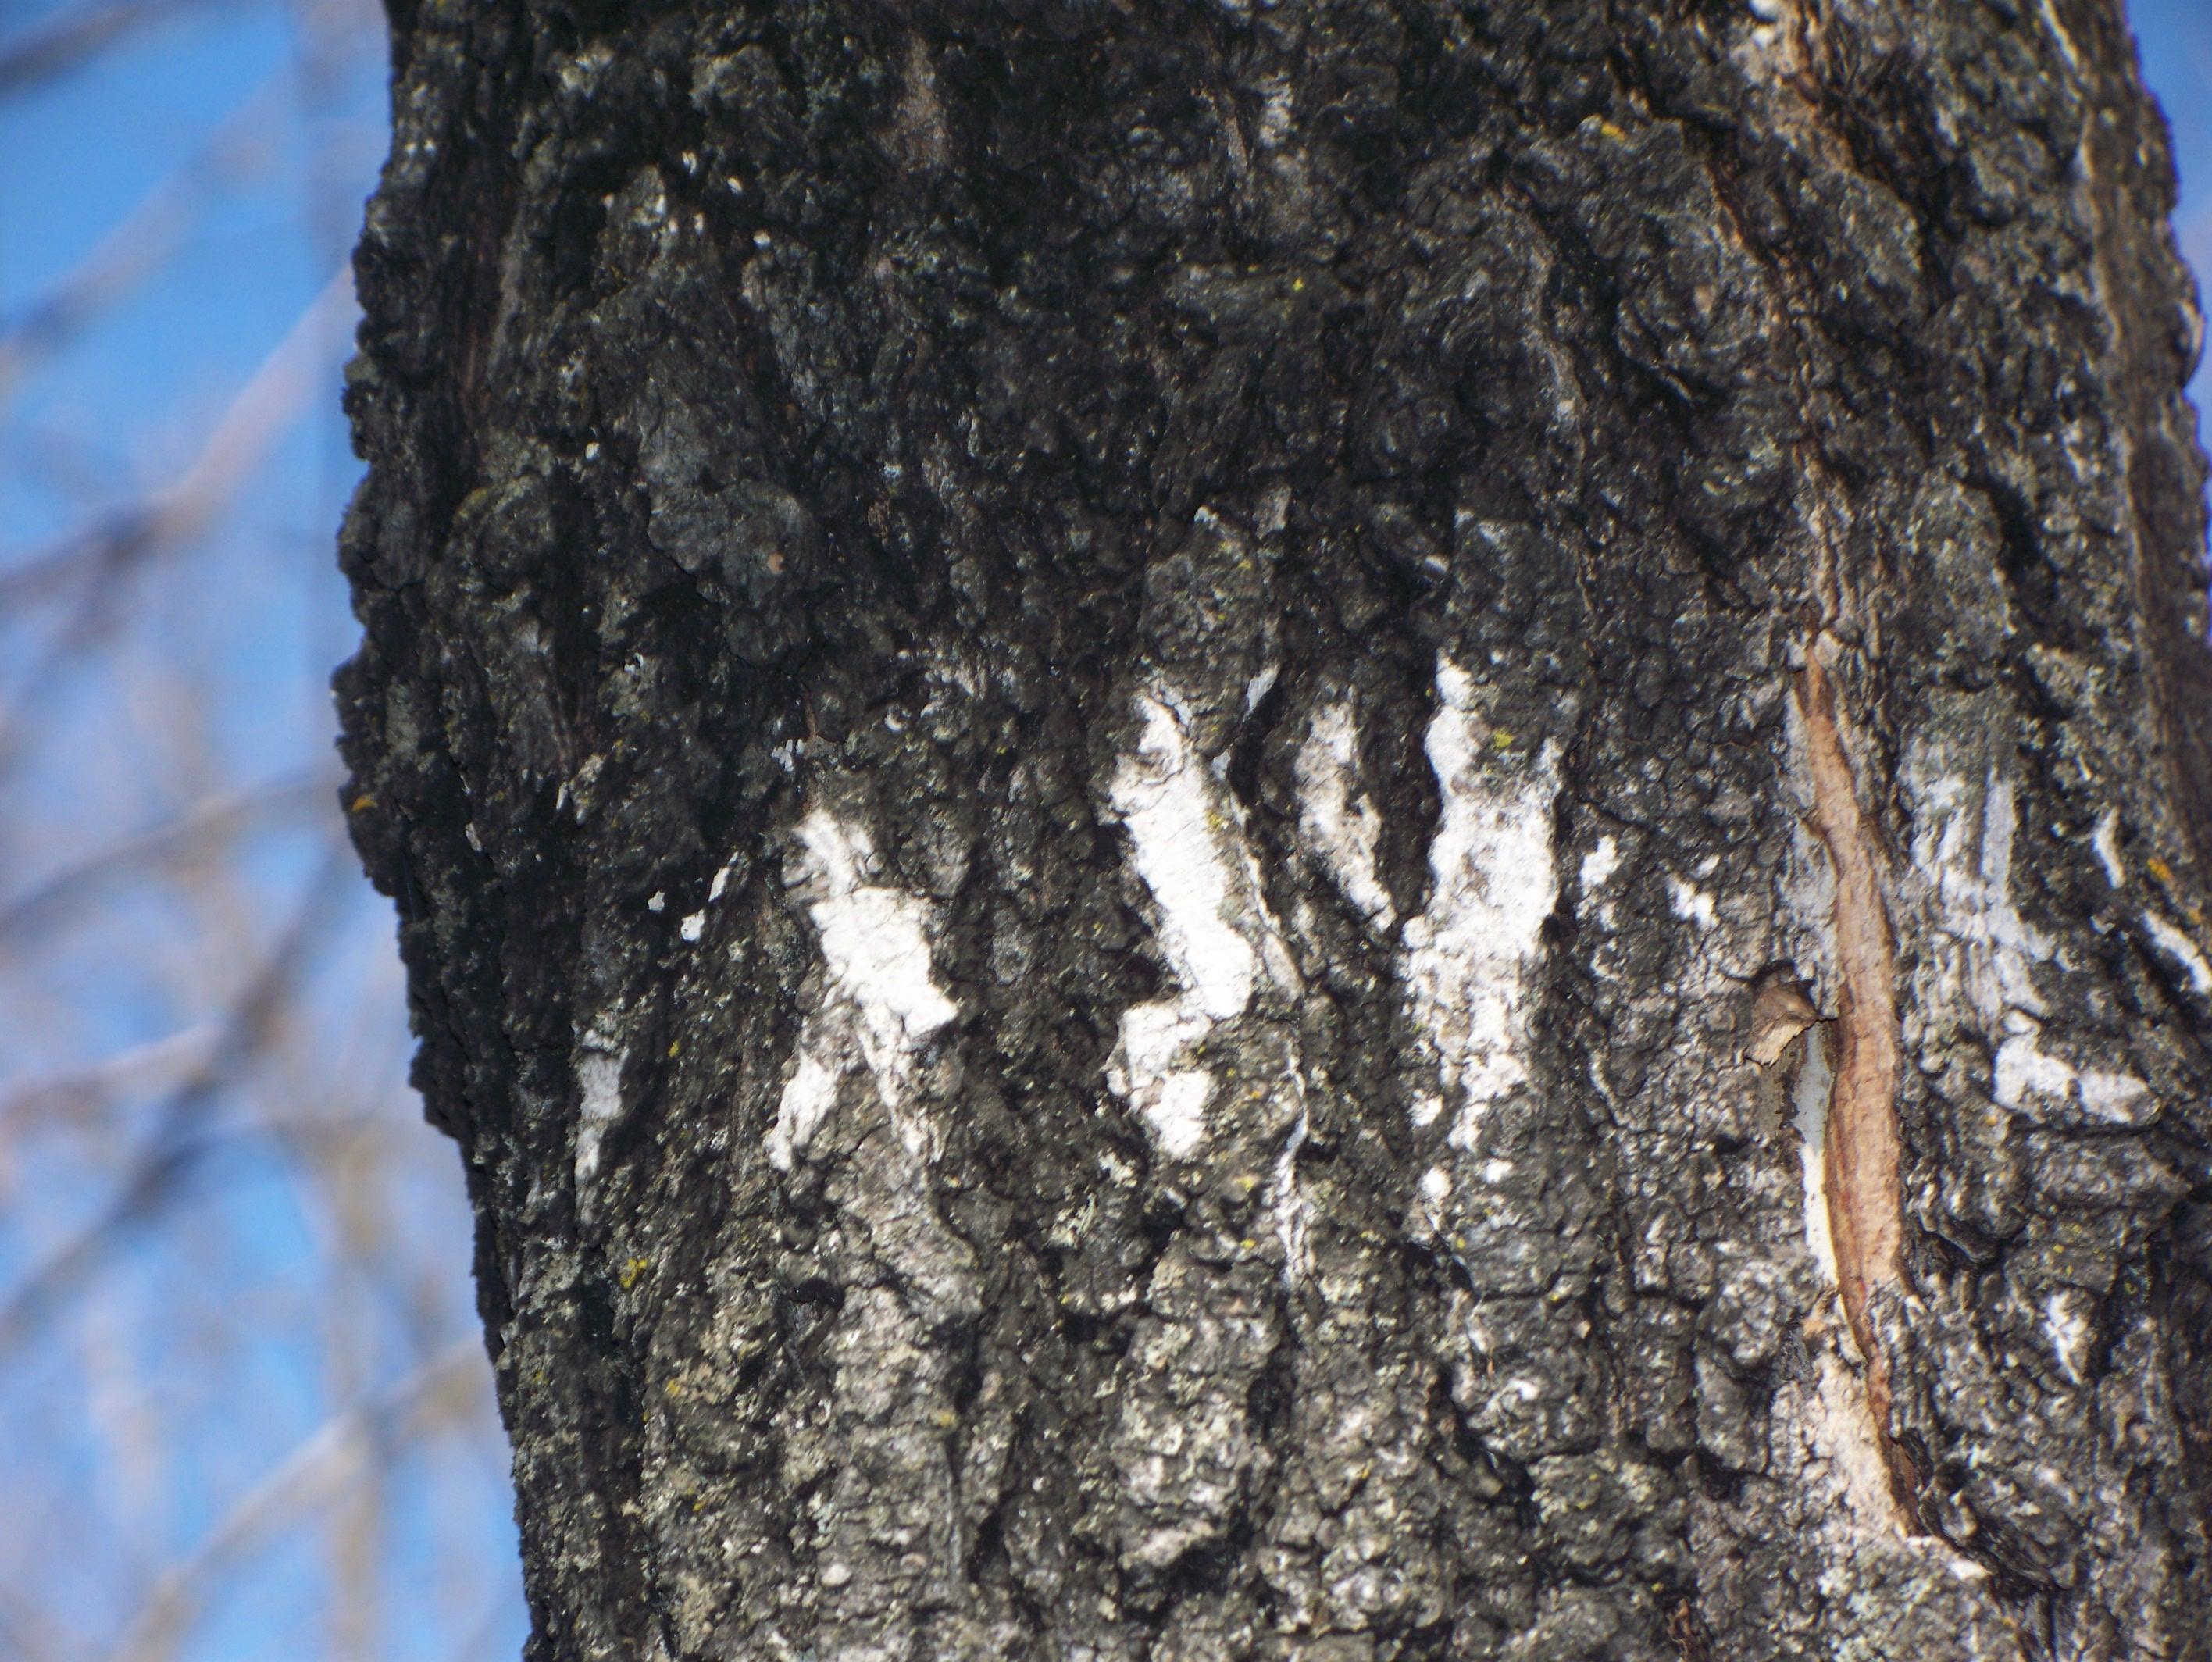 UWL Website - Norway maple bark